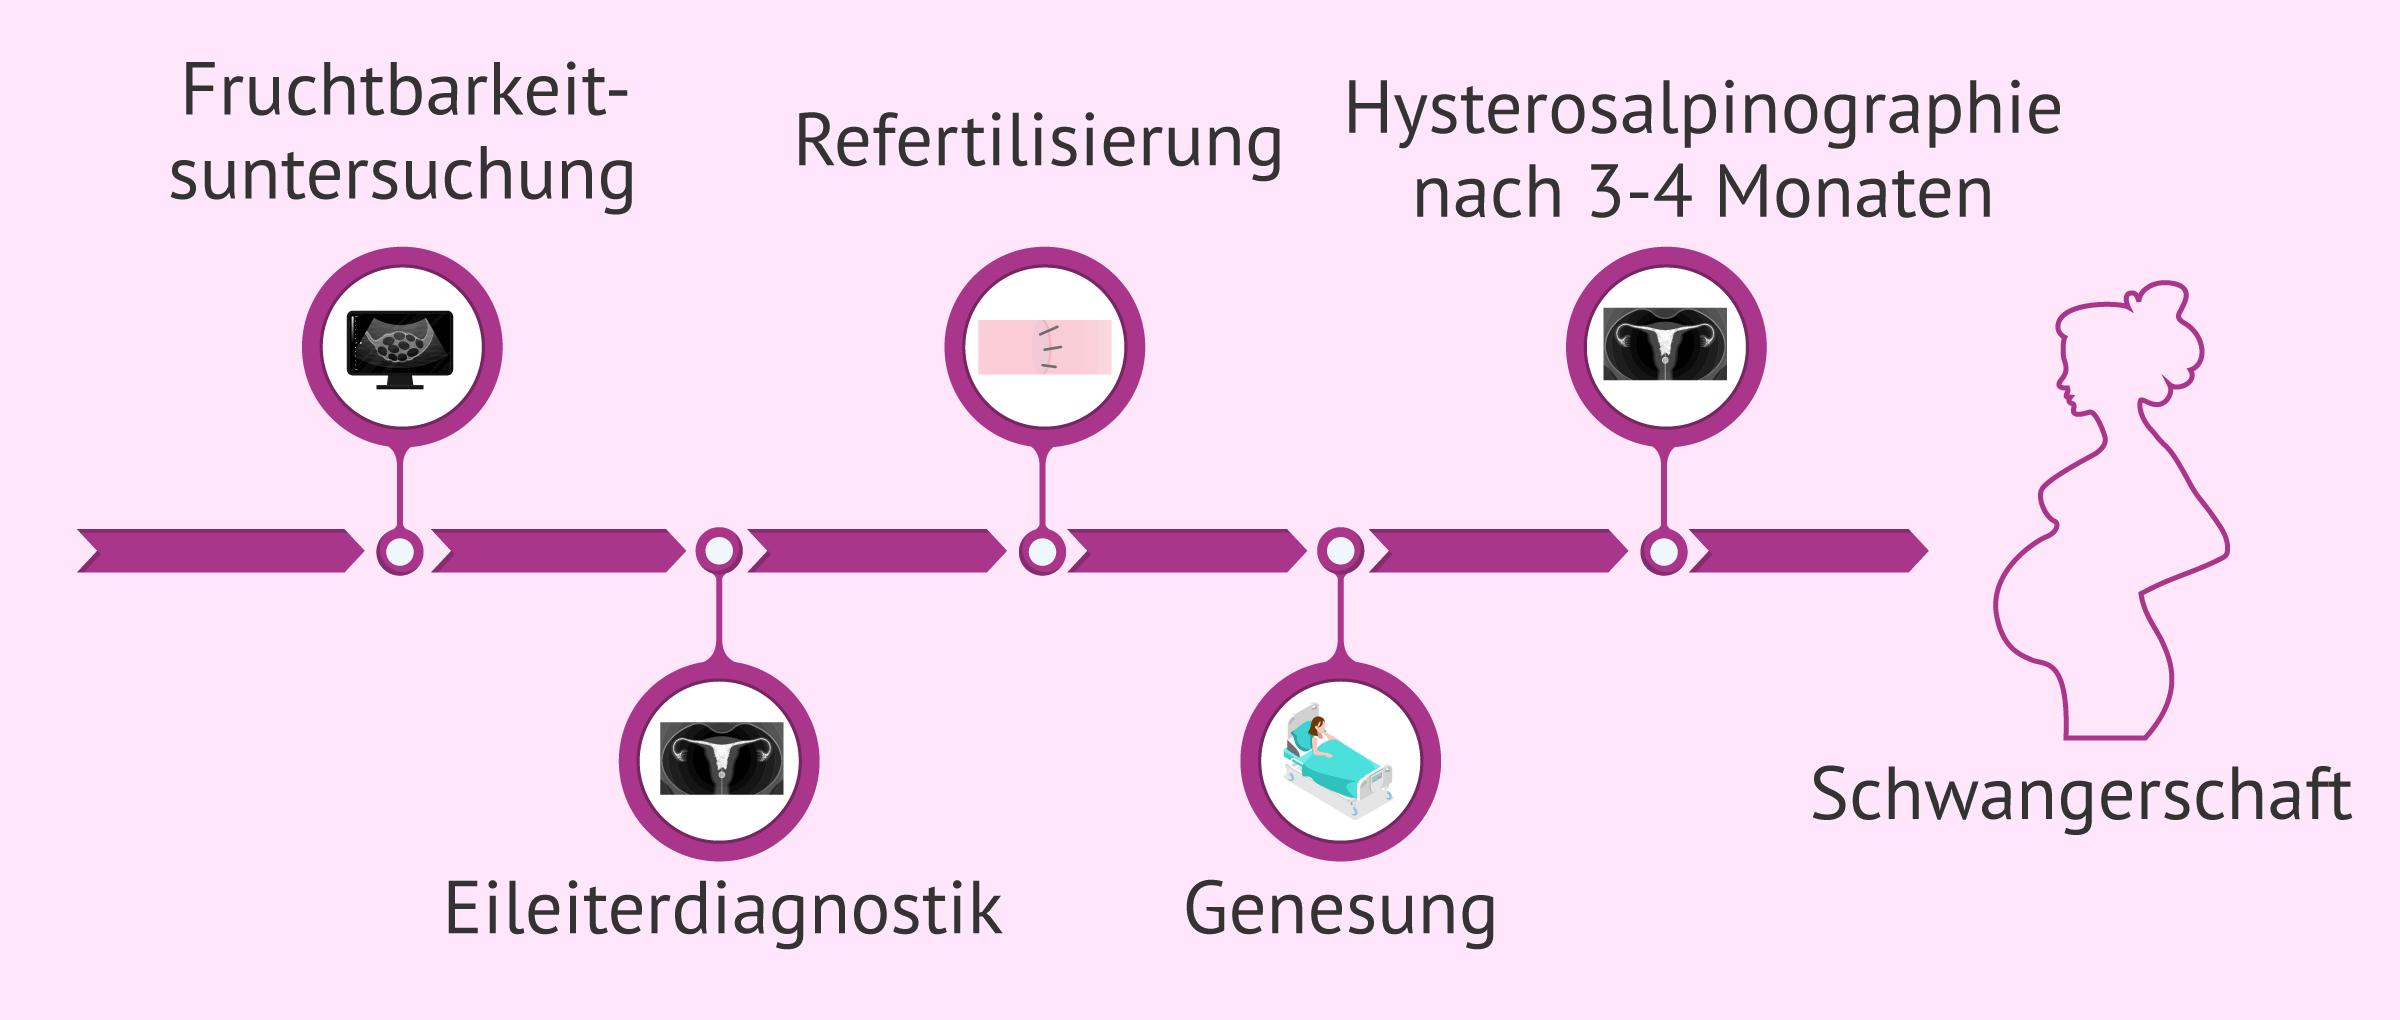 Behandlungsschritte bei Refertilisierung